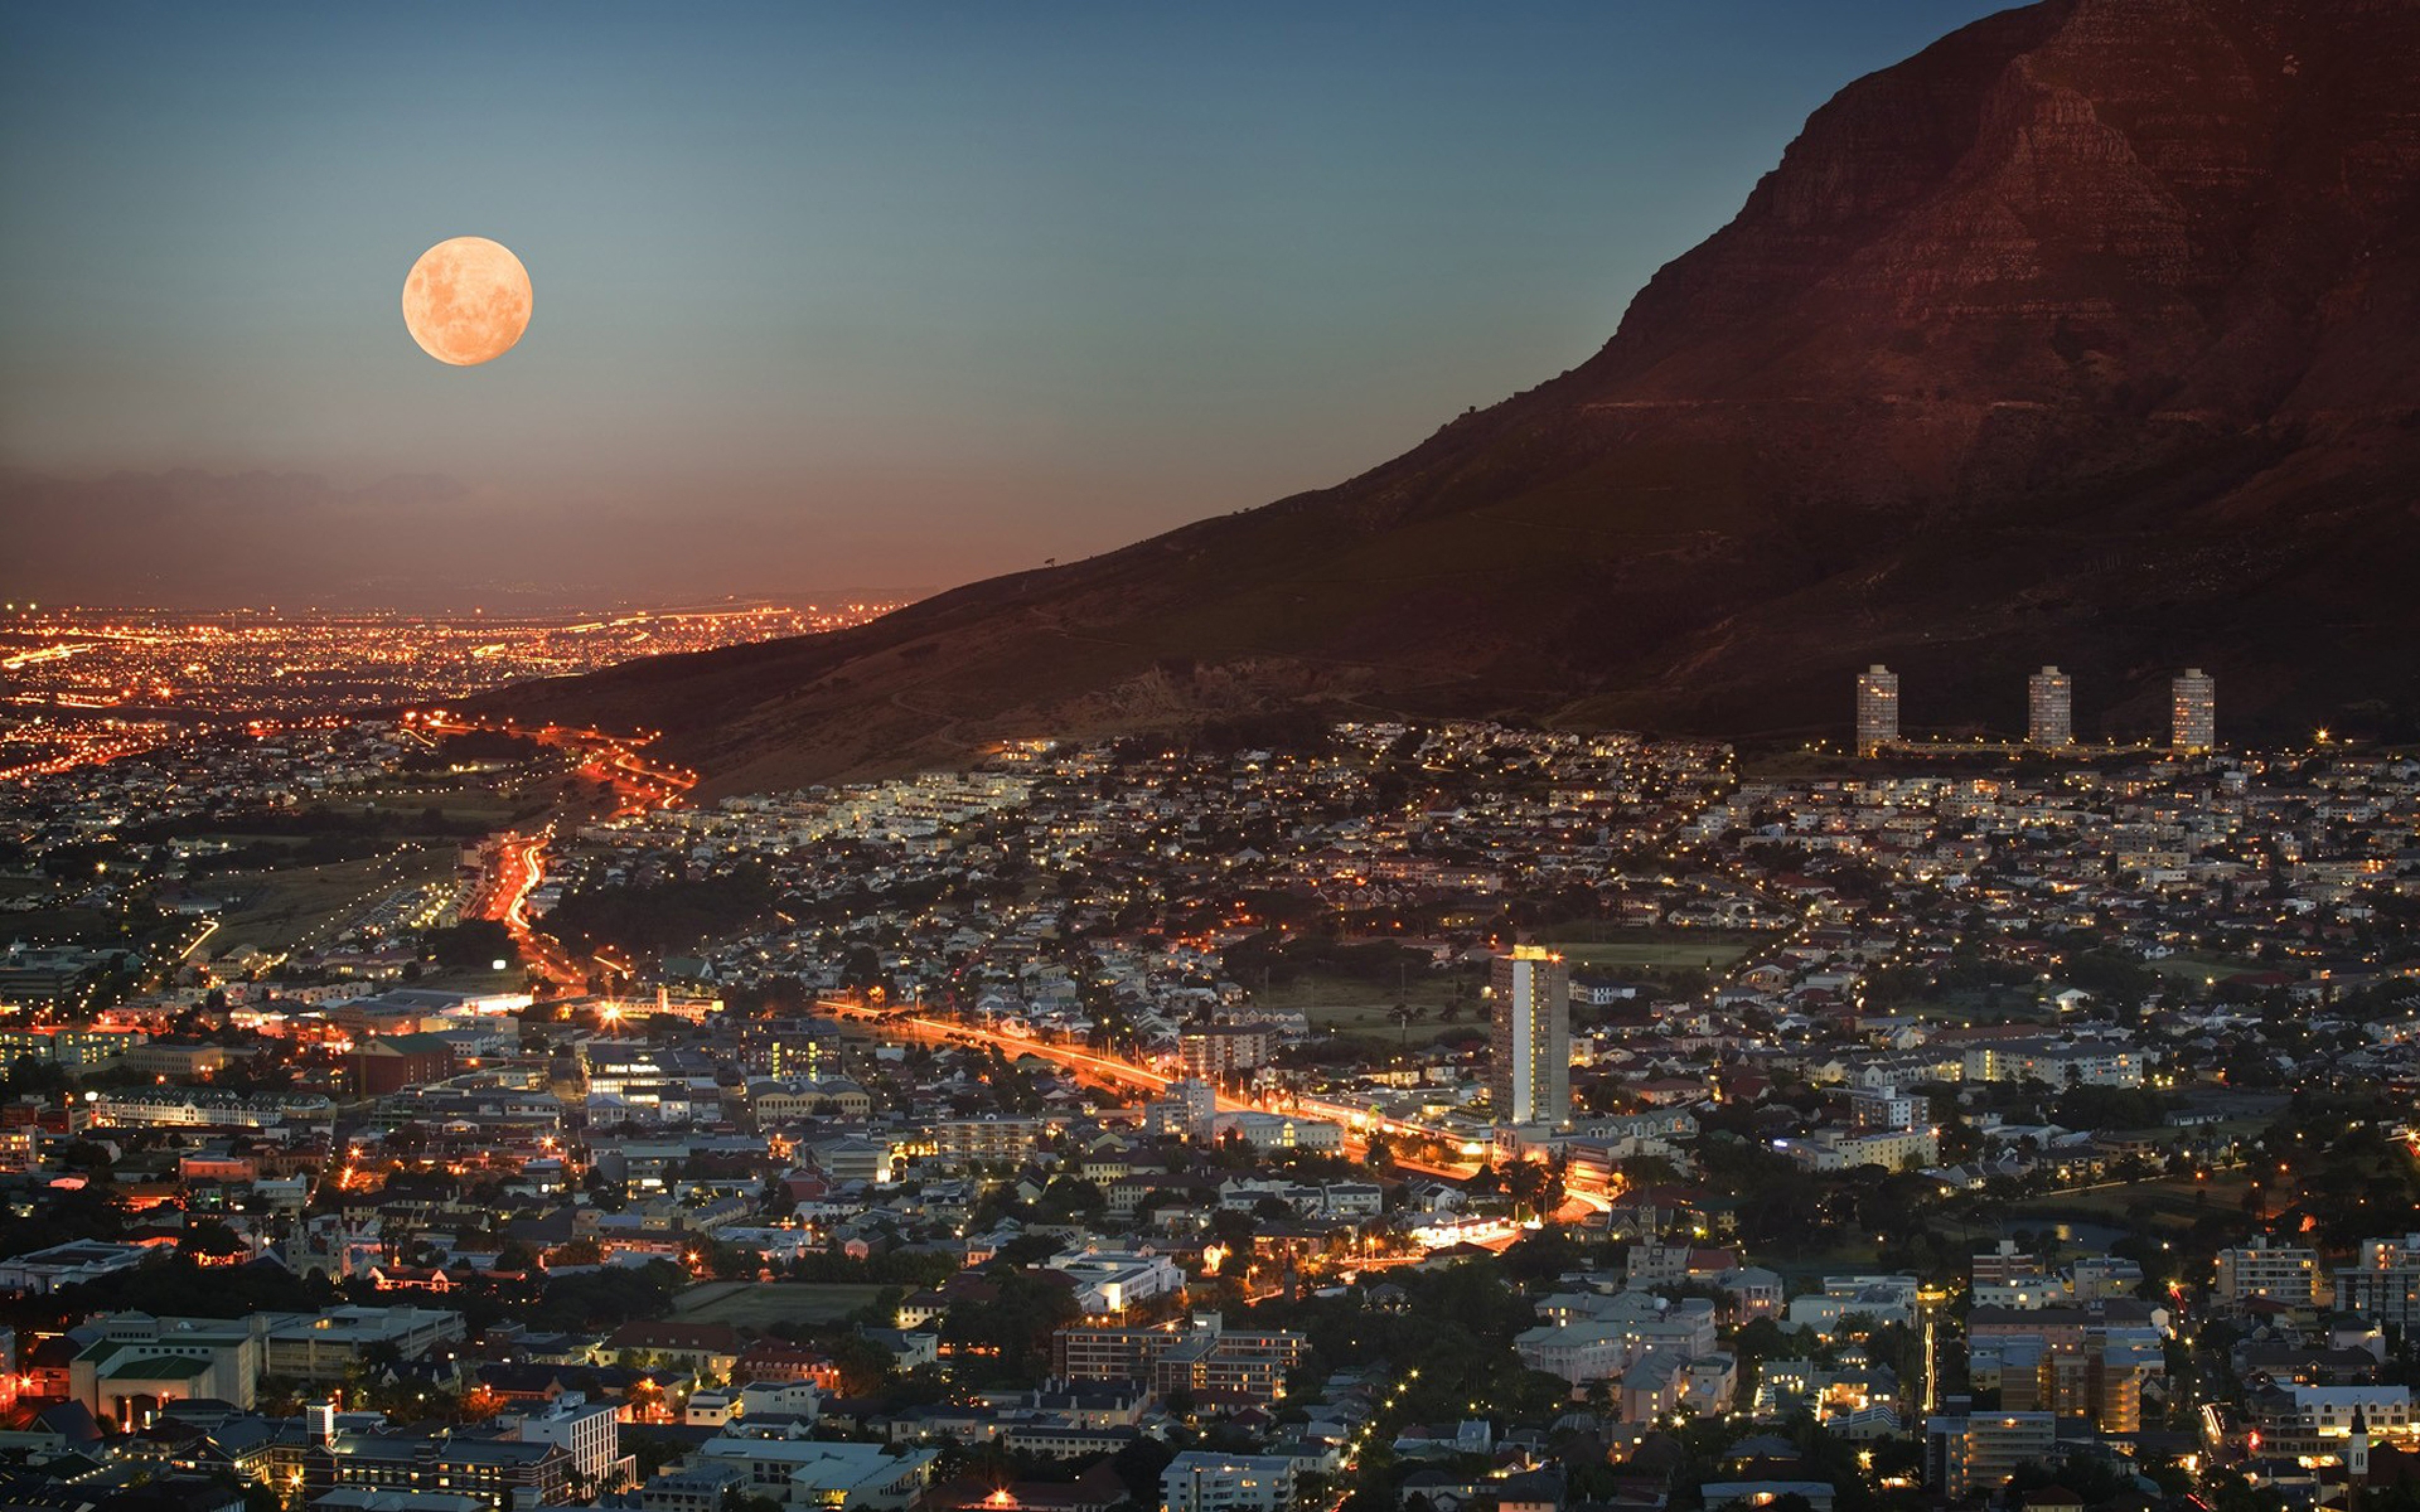 Sky Moon Mountain View Elevation Wallpaper Background Ultra HD 4K 3840x2400